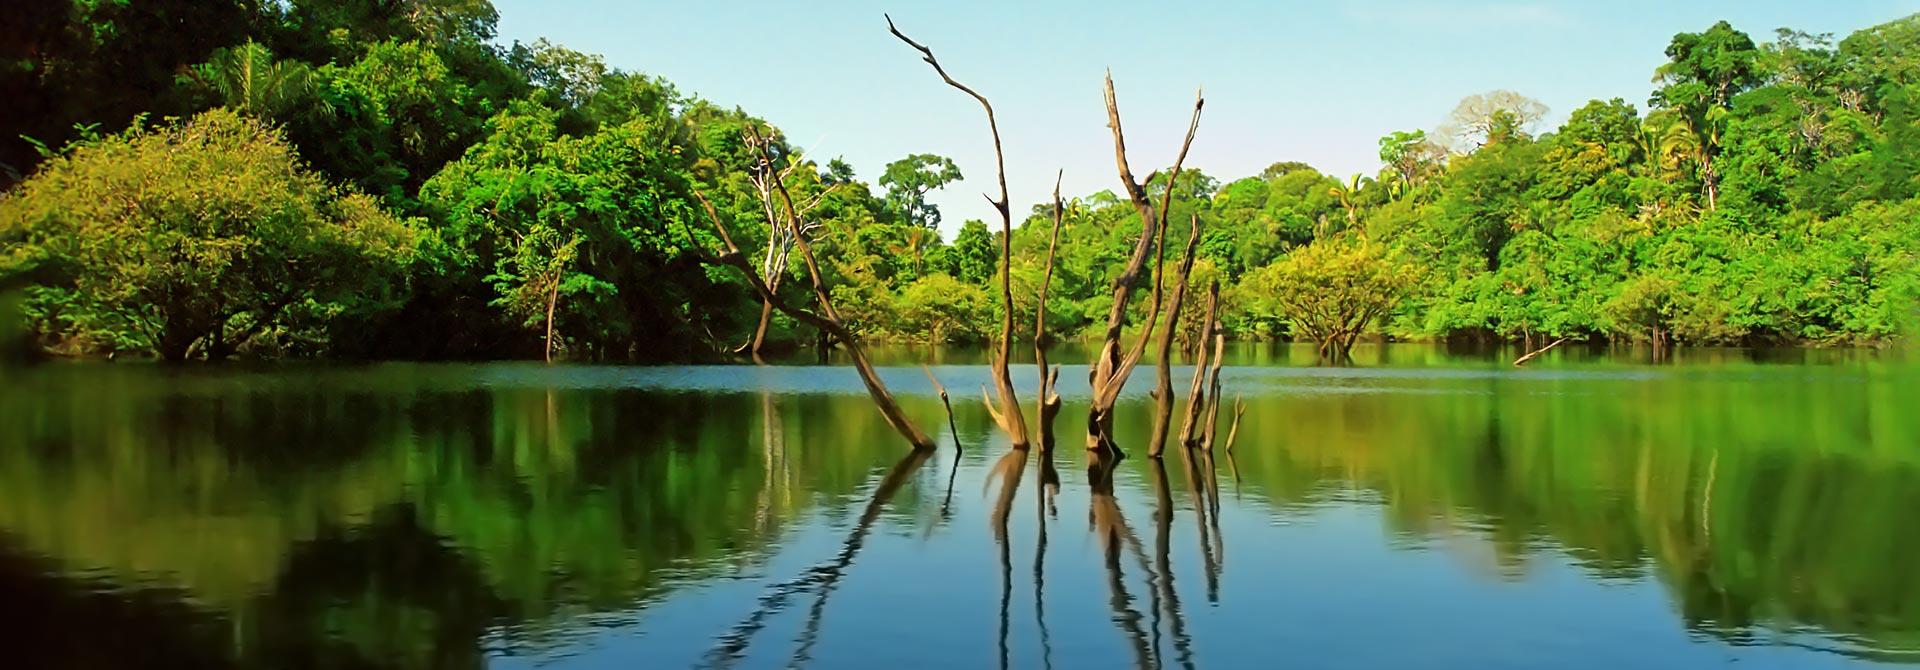 In the Amazon, Brazil